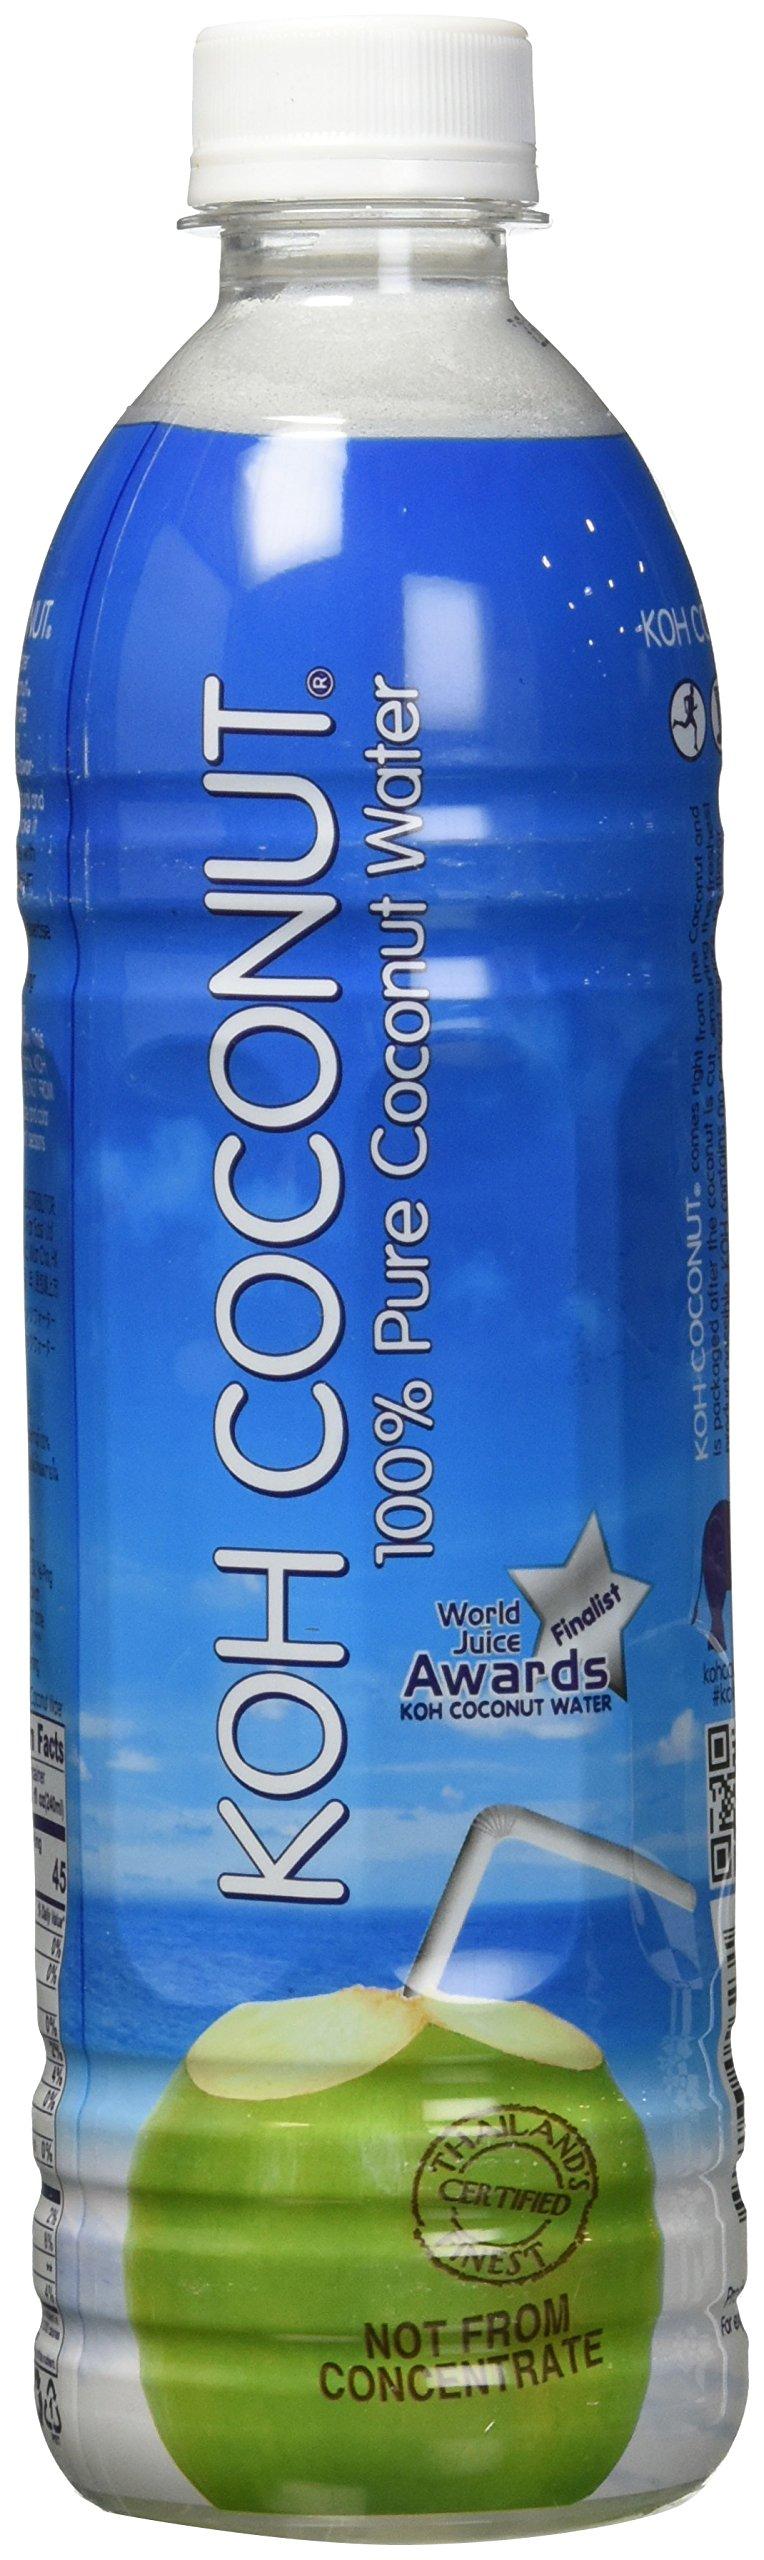 Amazon Com Koh Coconut 100 Pure Pink Baby Coconut Water